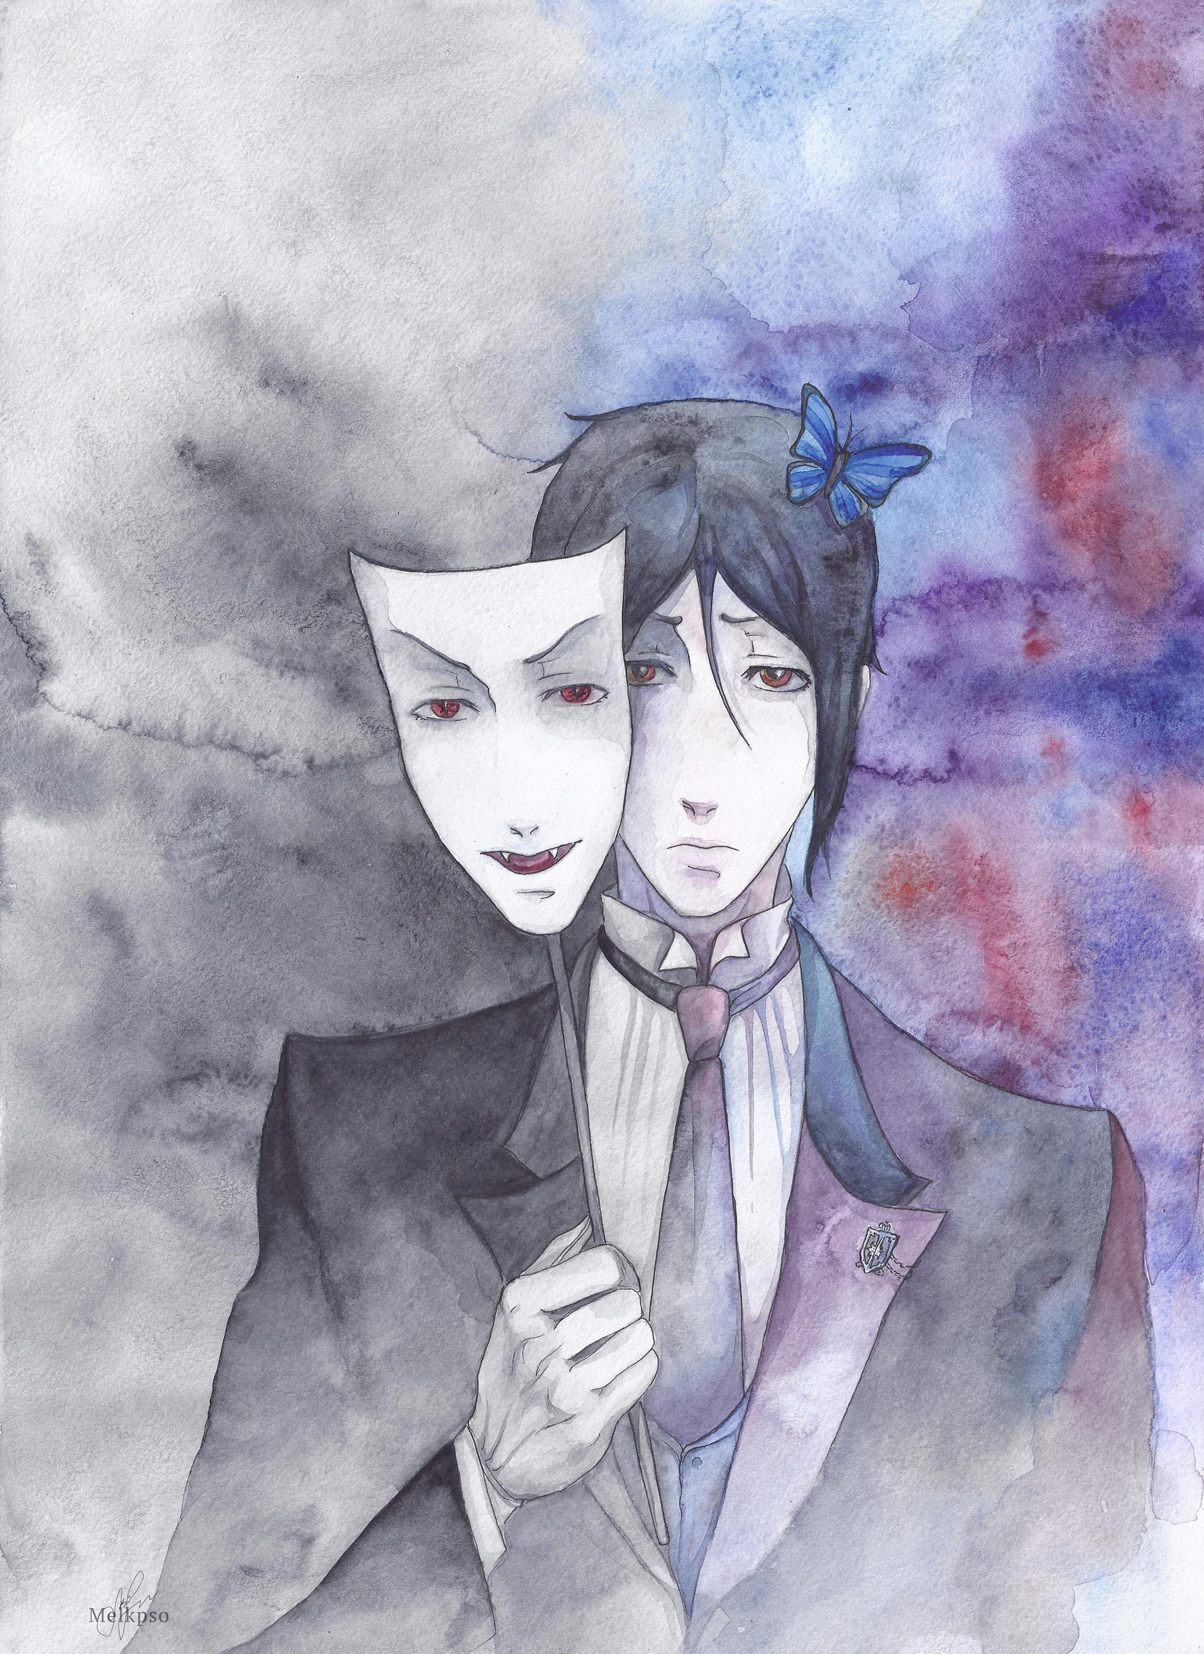 Sebastian_the mask of the beast. by Melkpso